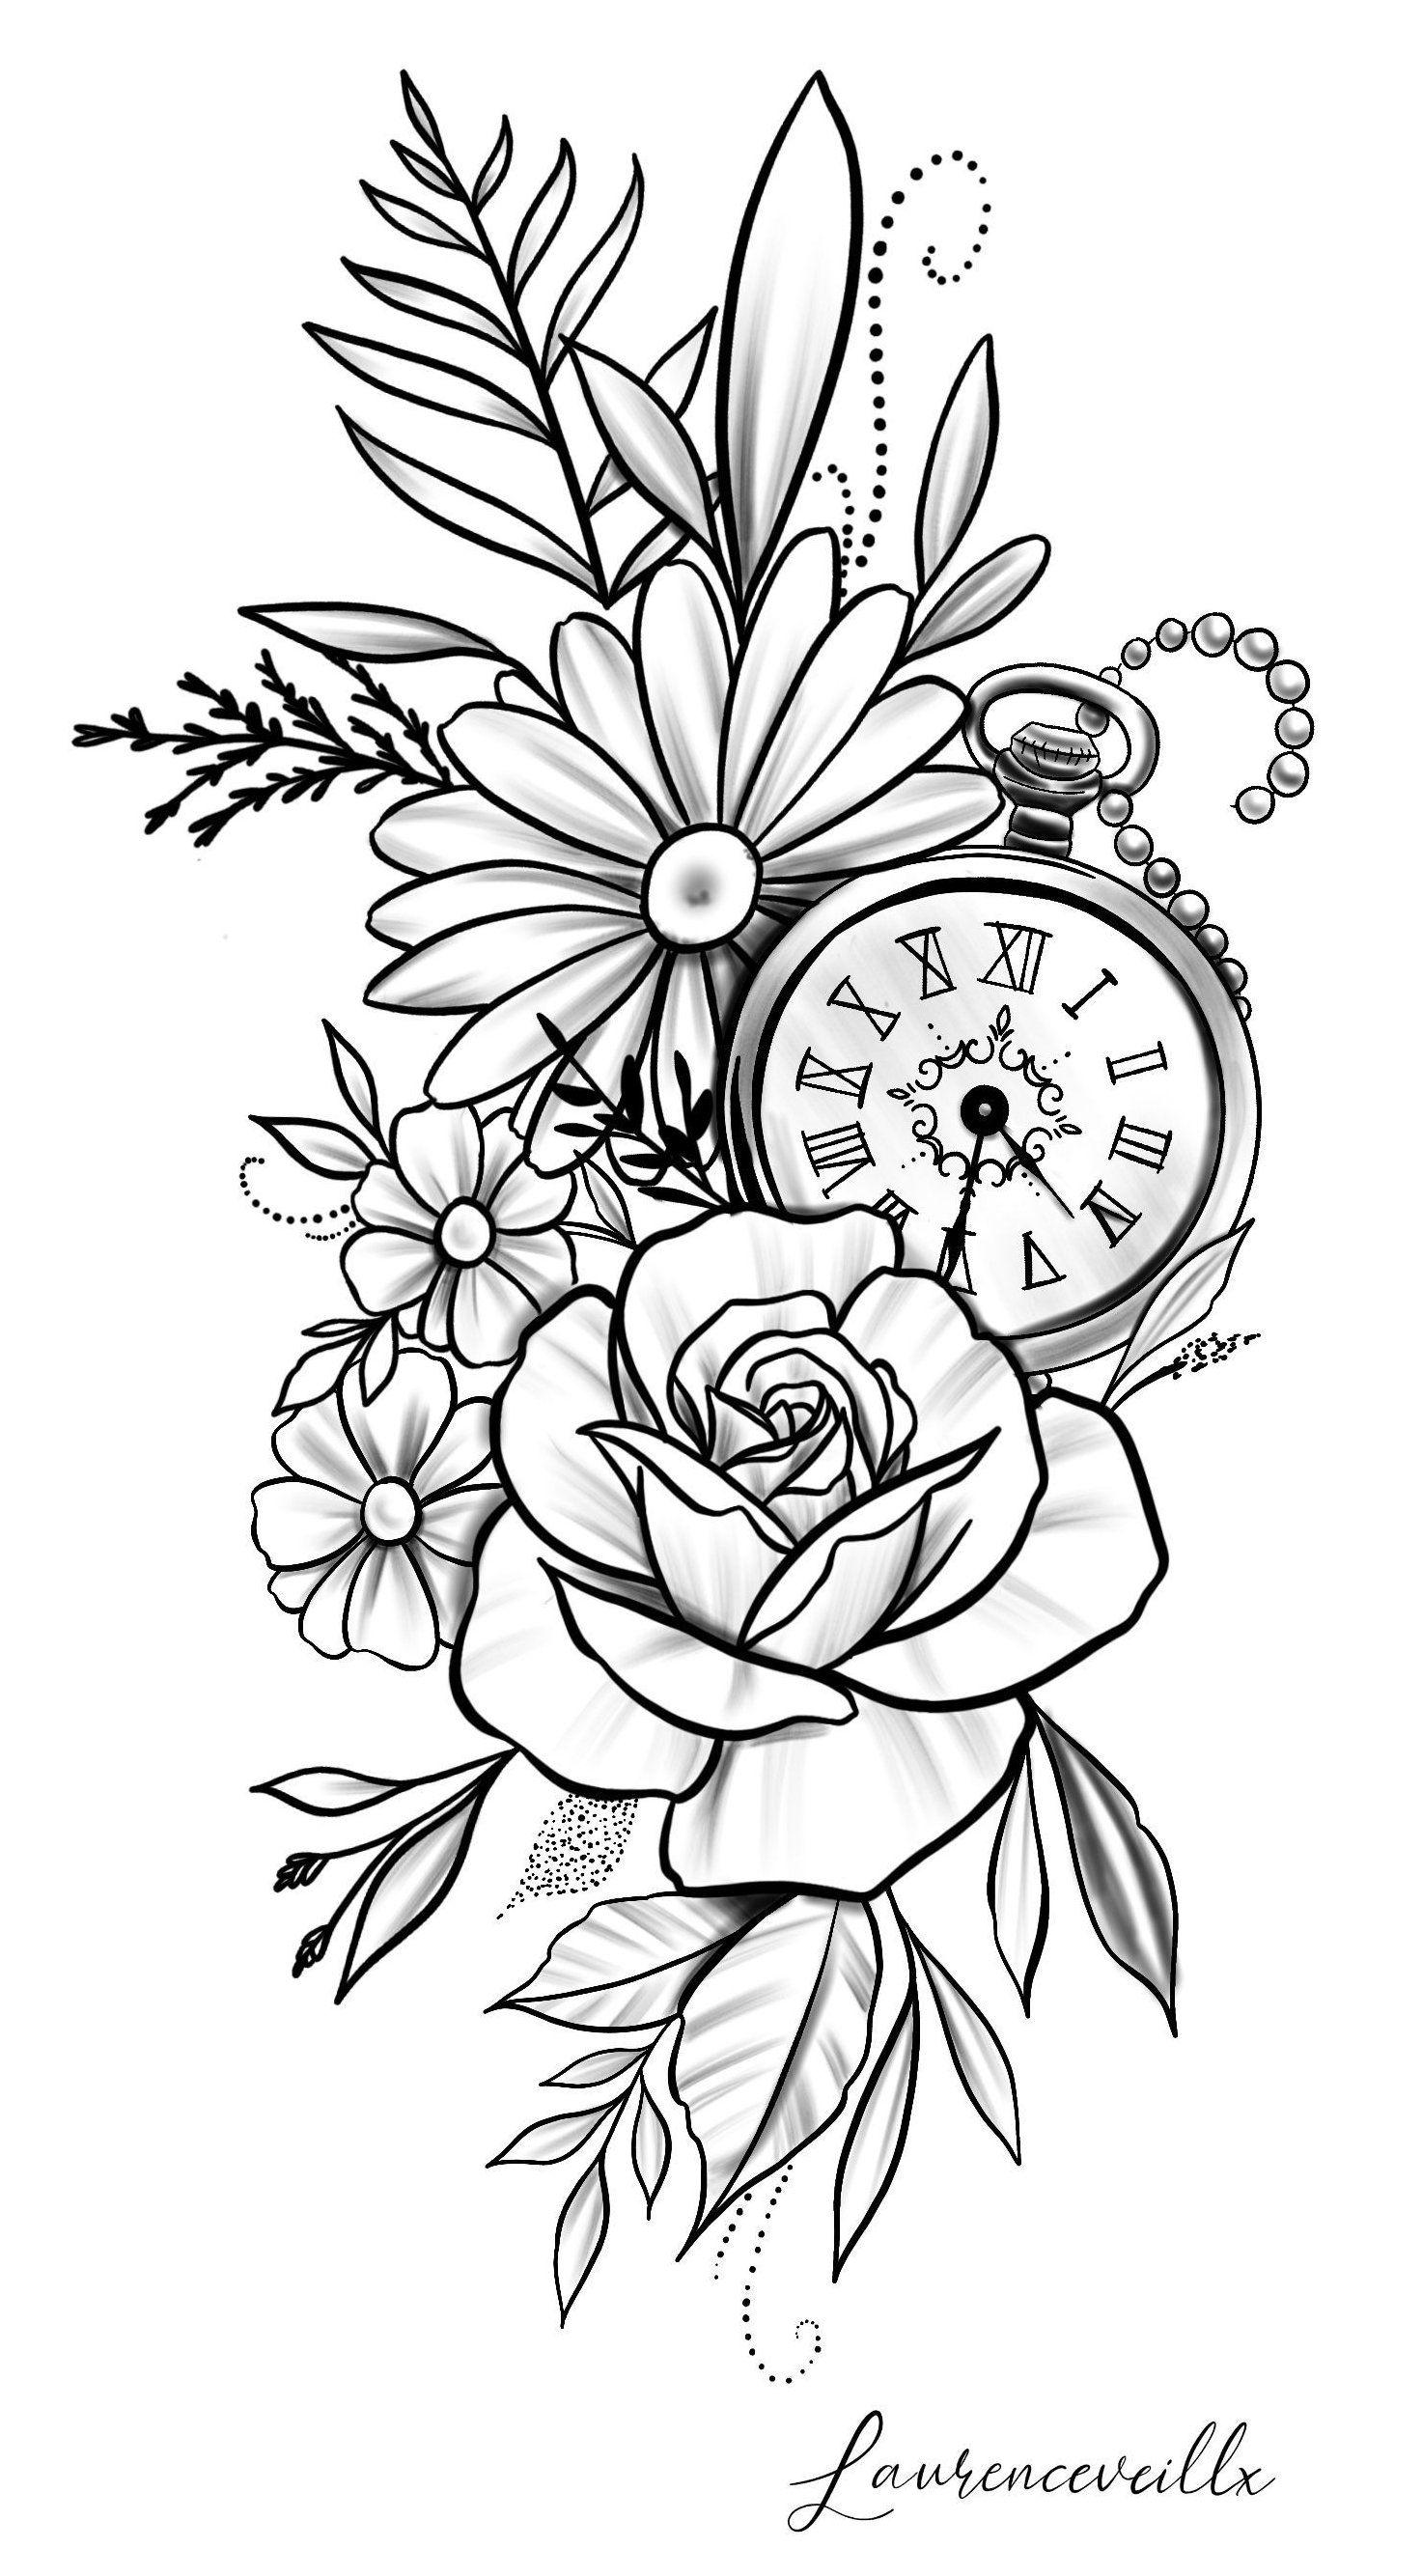 Tattoo Design Digital Download Art Print Par Laurencevartiste Clock And Rose Tattoo Sketch Rose Dai In 2020 Watch Tattoo Design Floral Tattoo Design Watch Tattoos